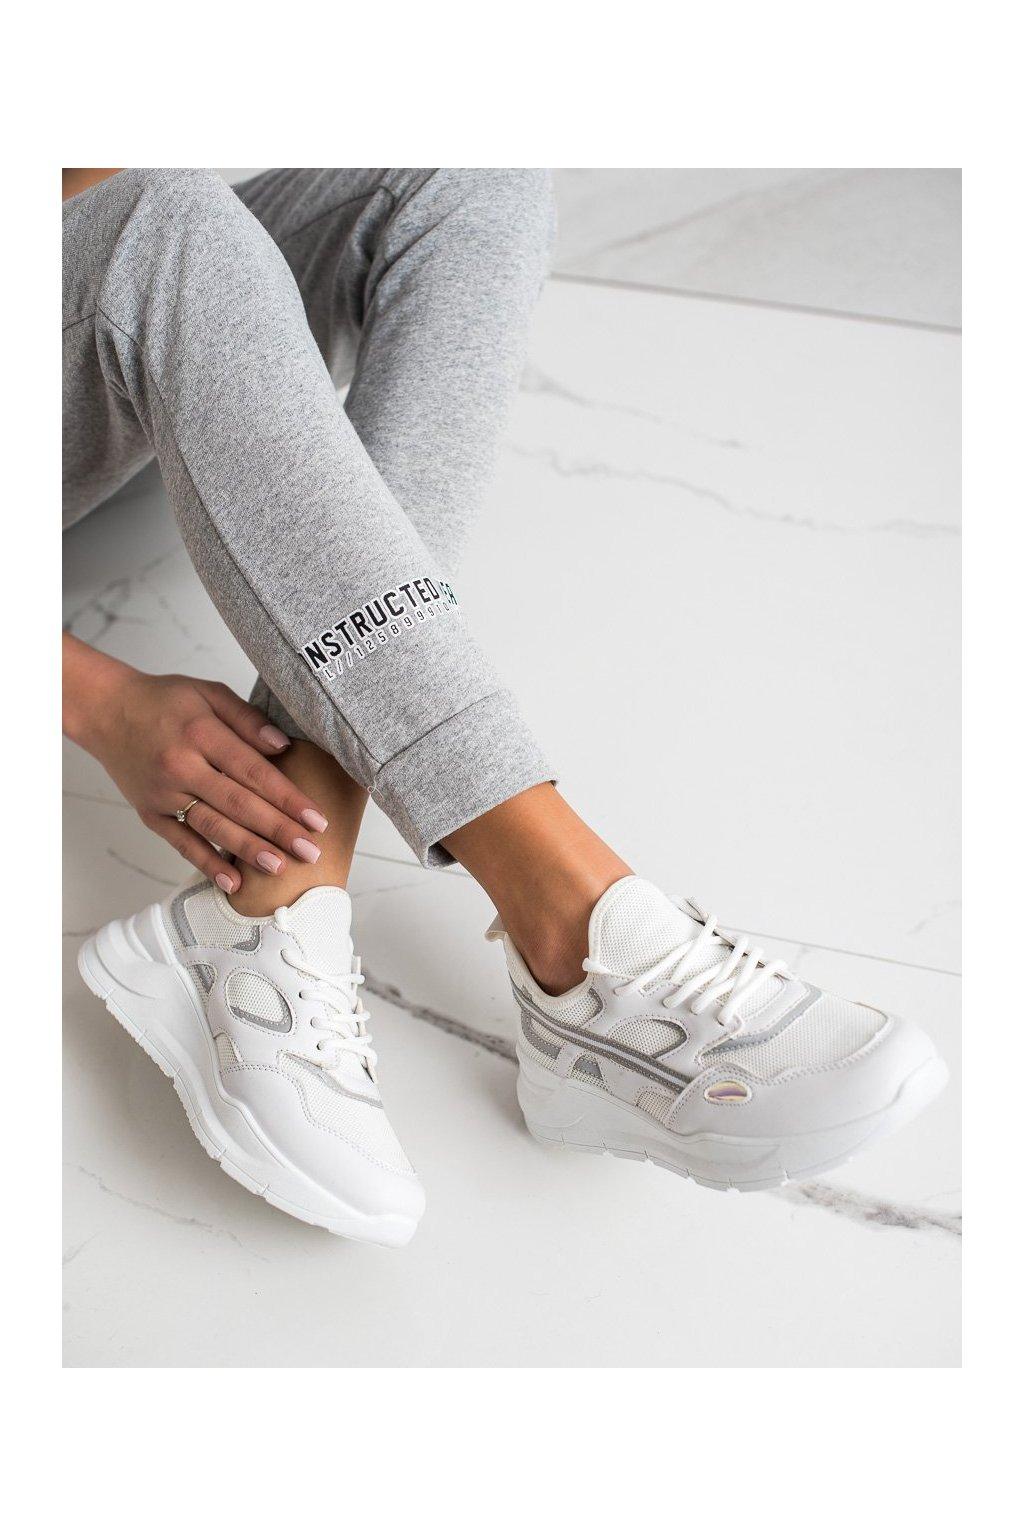 Biele dámske tenisky Trendi kod BO-560W